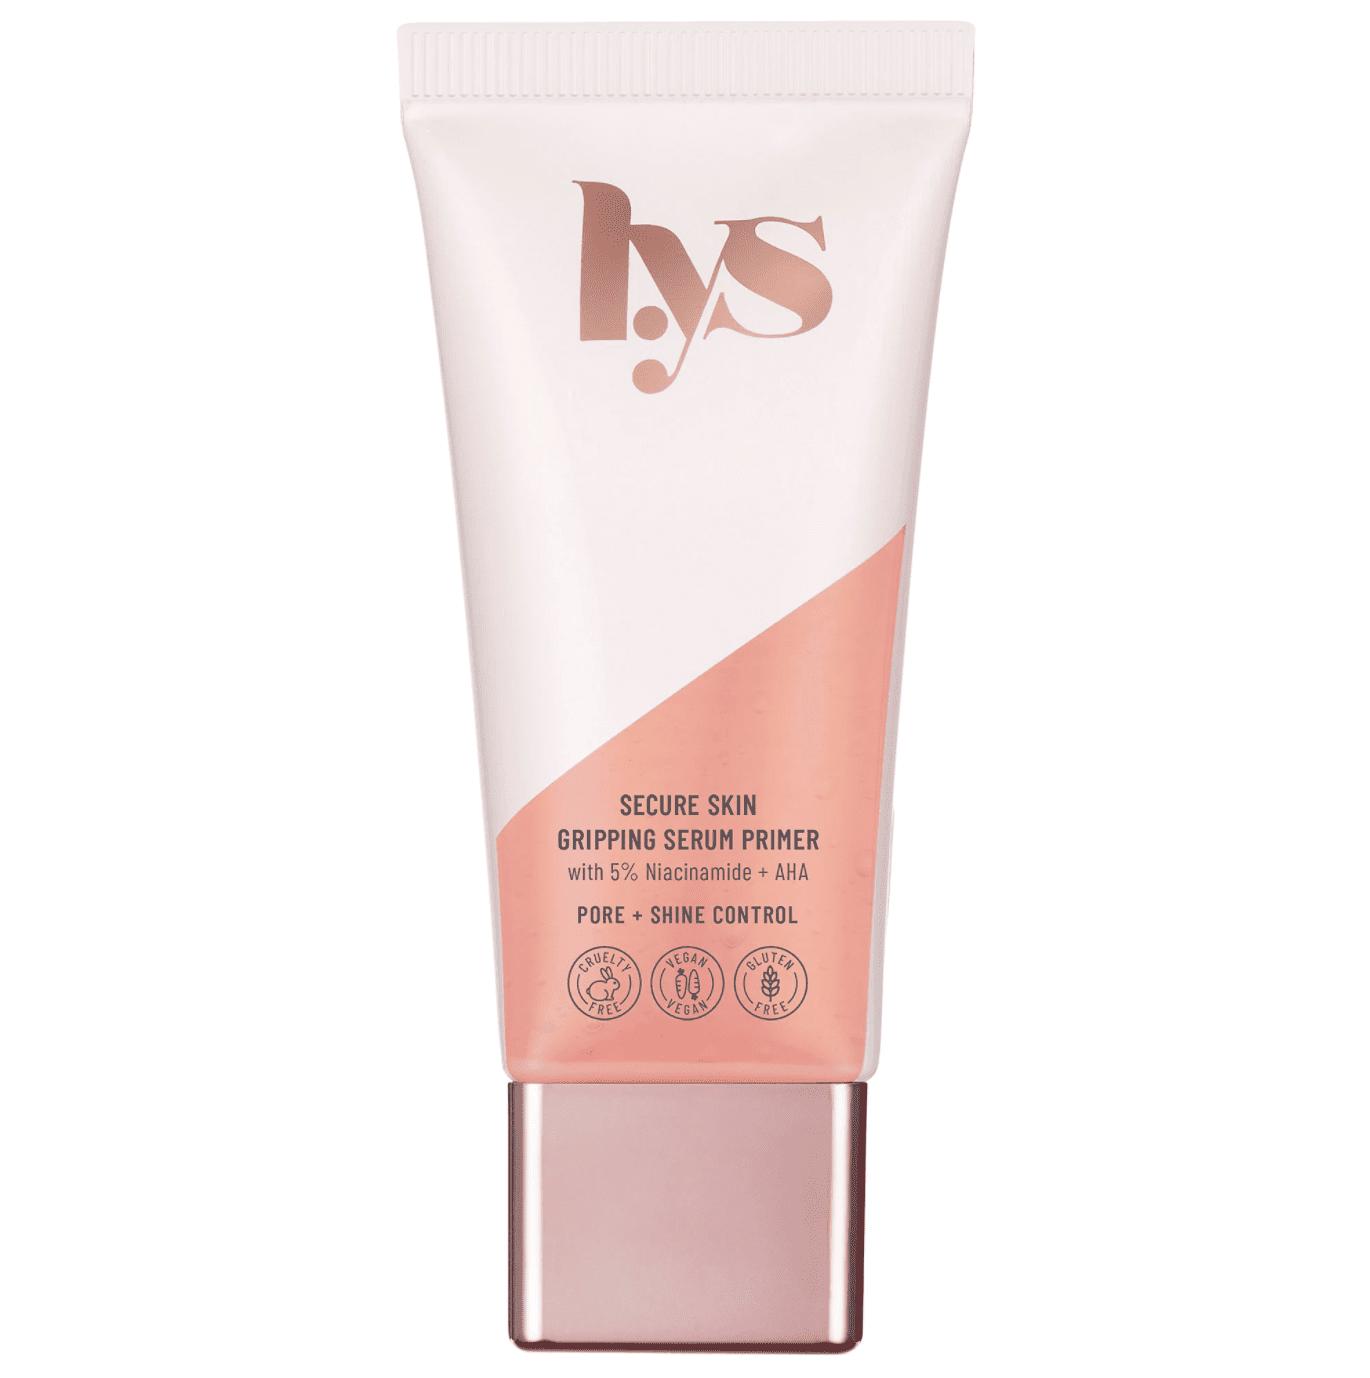 LYS Beauty Secure Skin Gripping Serum Primer